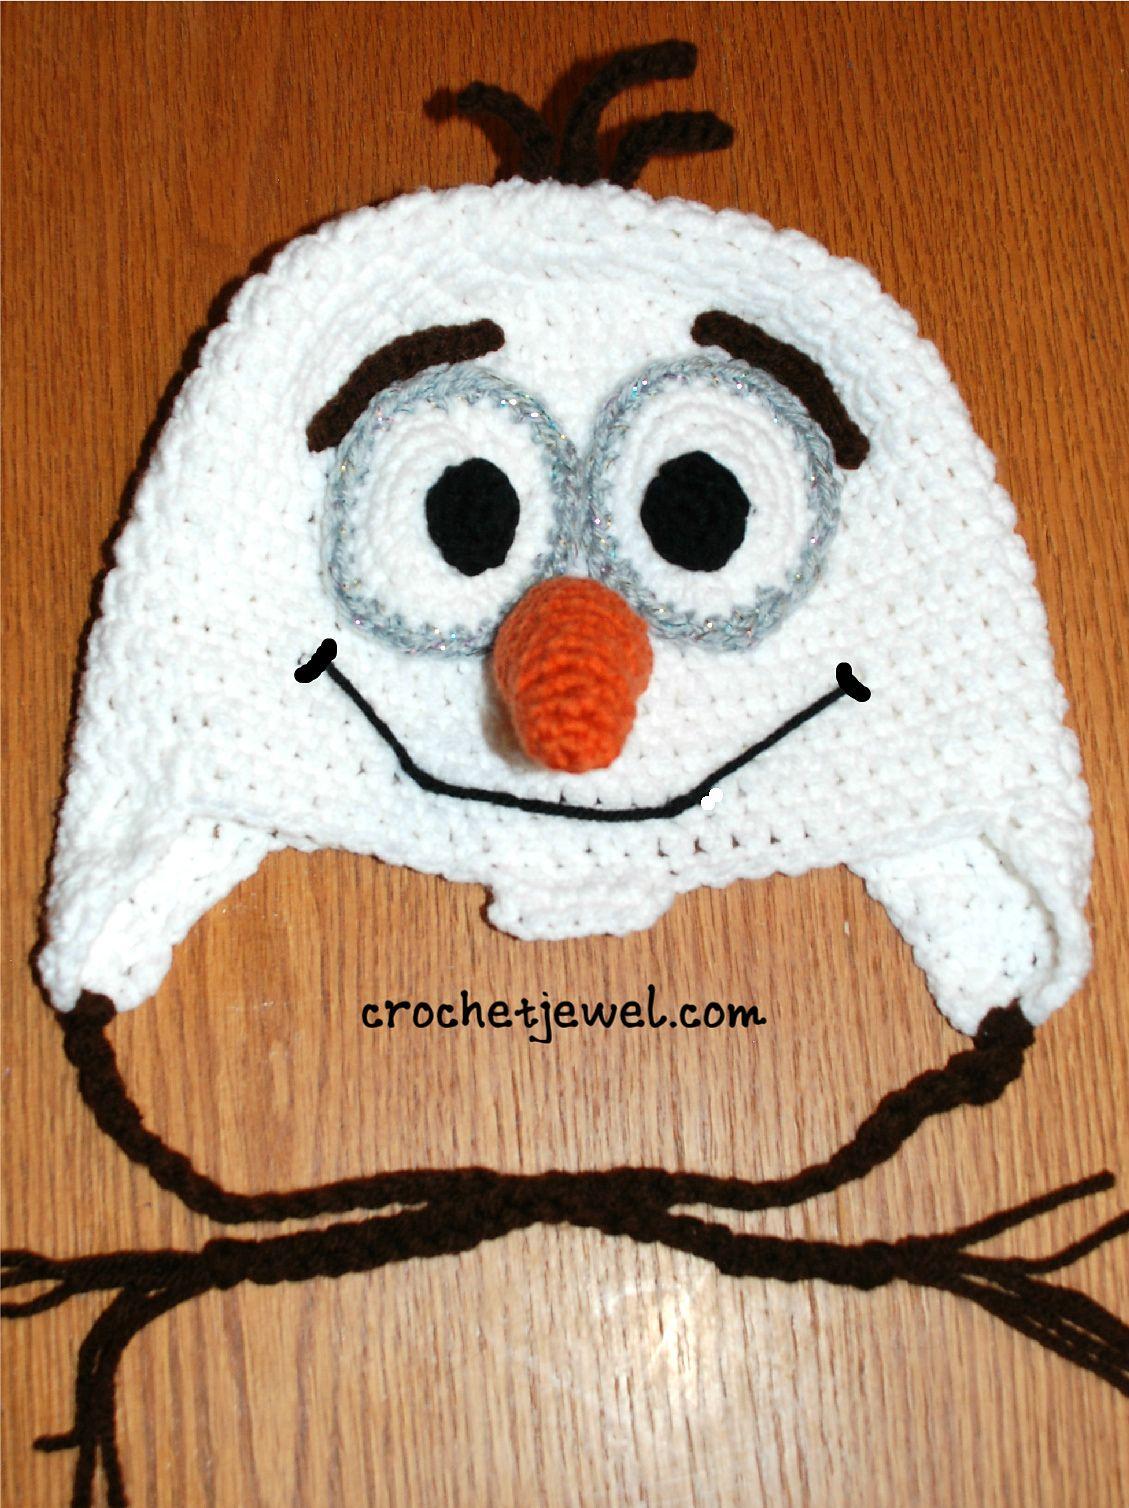 Ravelry: recently added crochet patterns | crochet | Pinterest ...